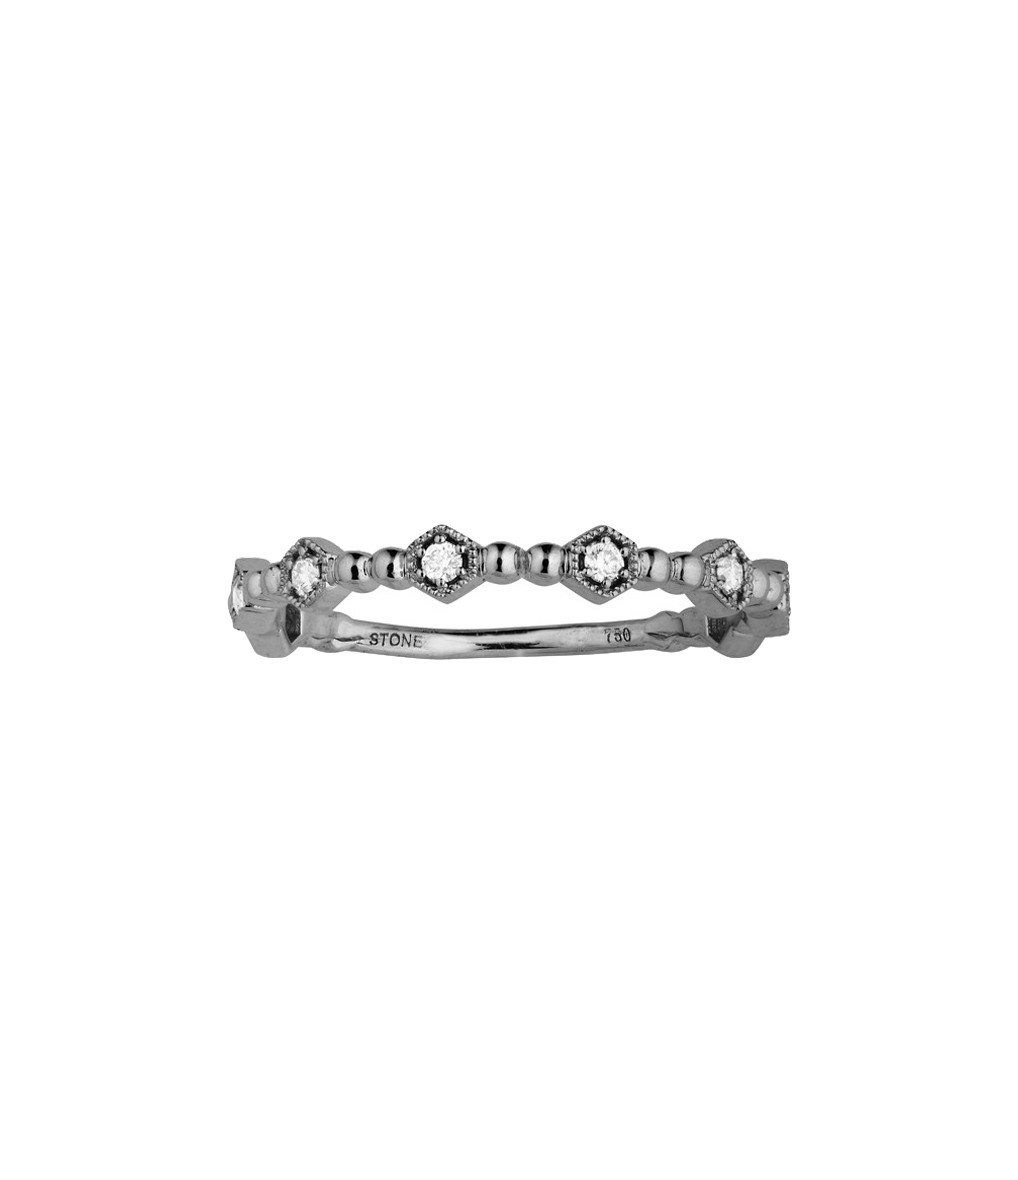 Bague Charmante Or Diamants - STONE